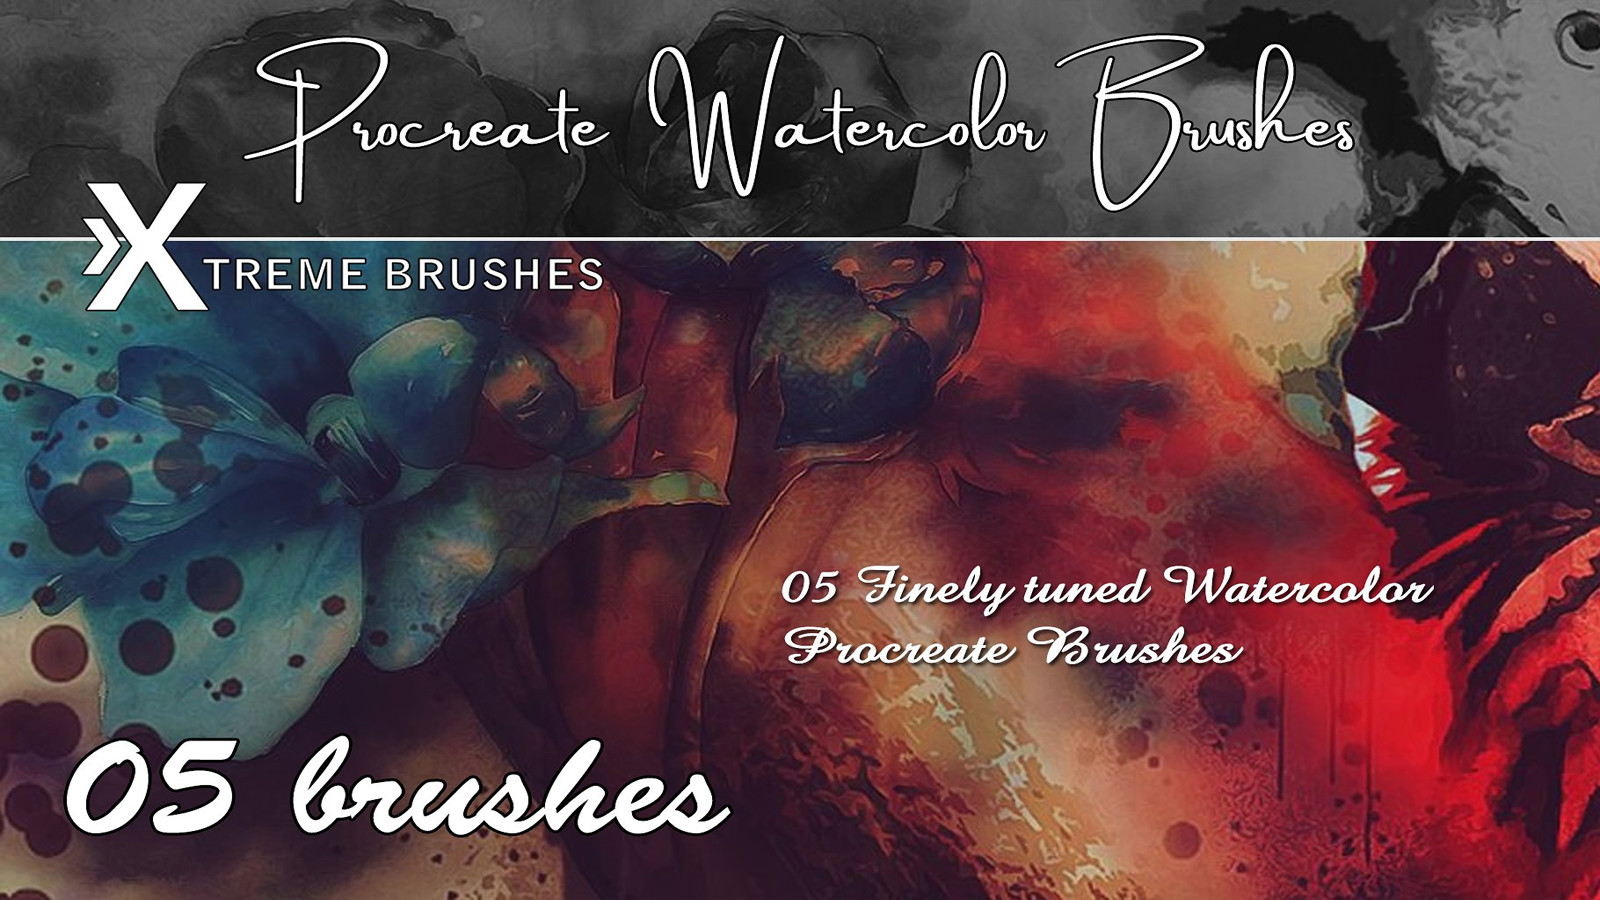 Rodd Lopes - Procreate Watercolor Brushes